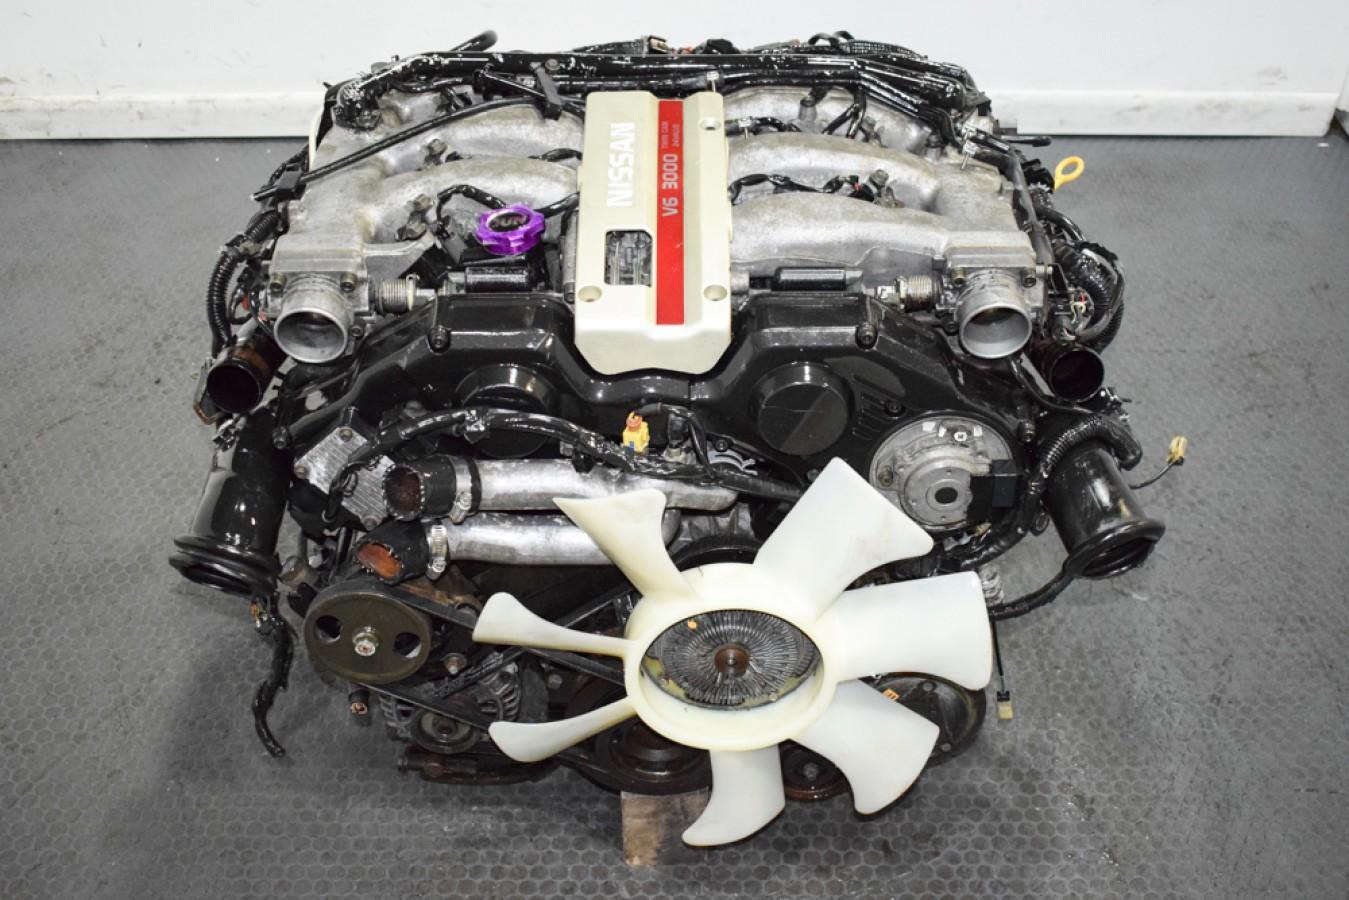 Low Mileage And Clean Jdm Nissan 300zx 91 96 Z32 Vg30dett Replacement Motor For Sale Nissan 300zx Vg30det Vg30de Engines J Spec Auto Sports